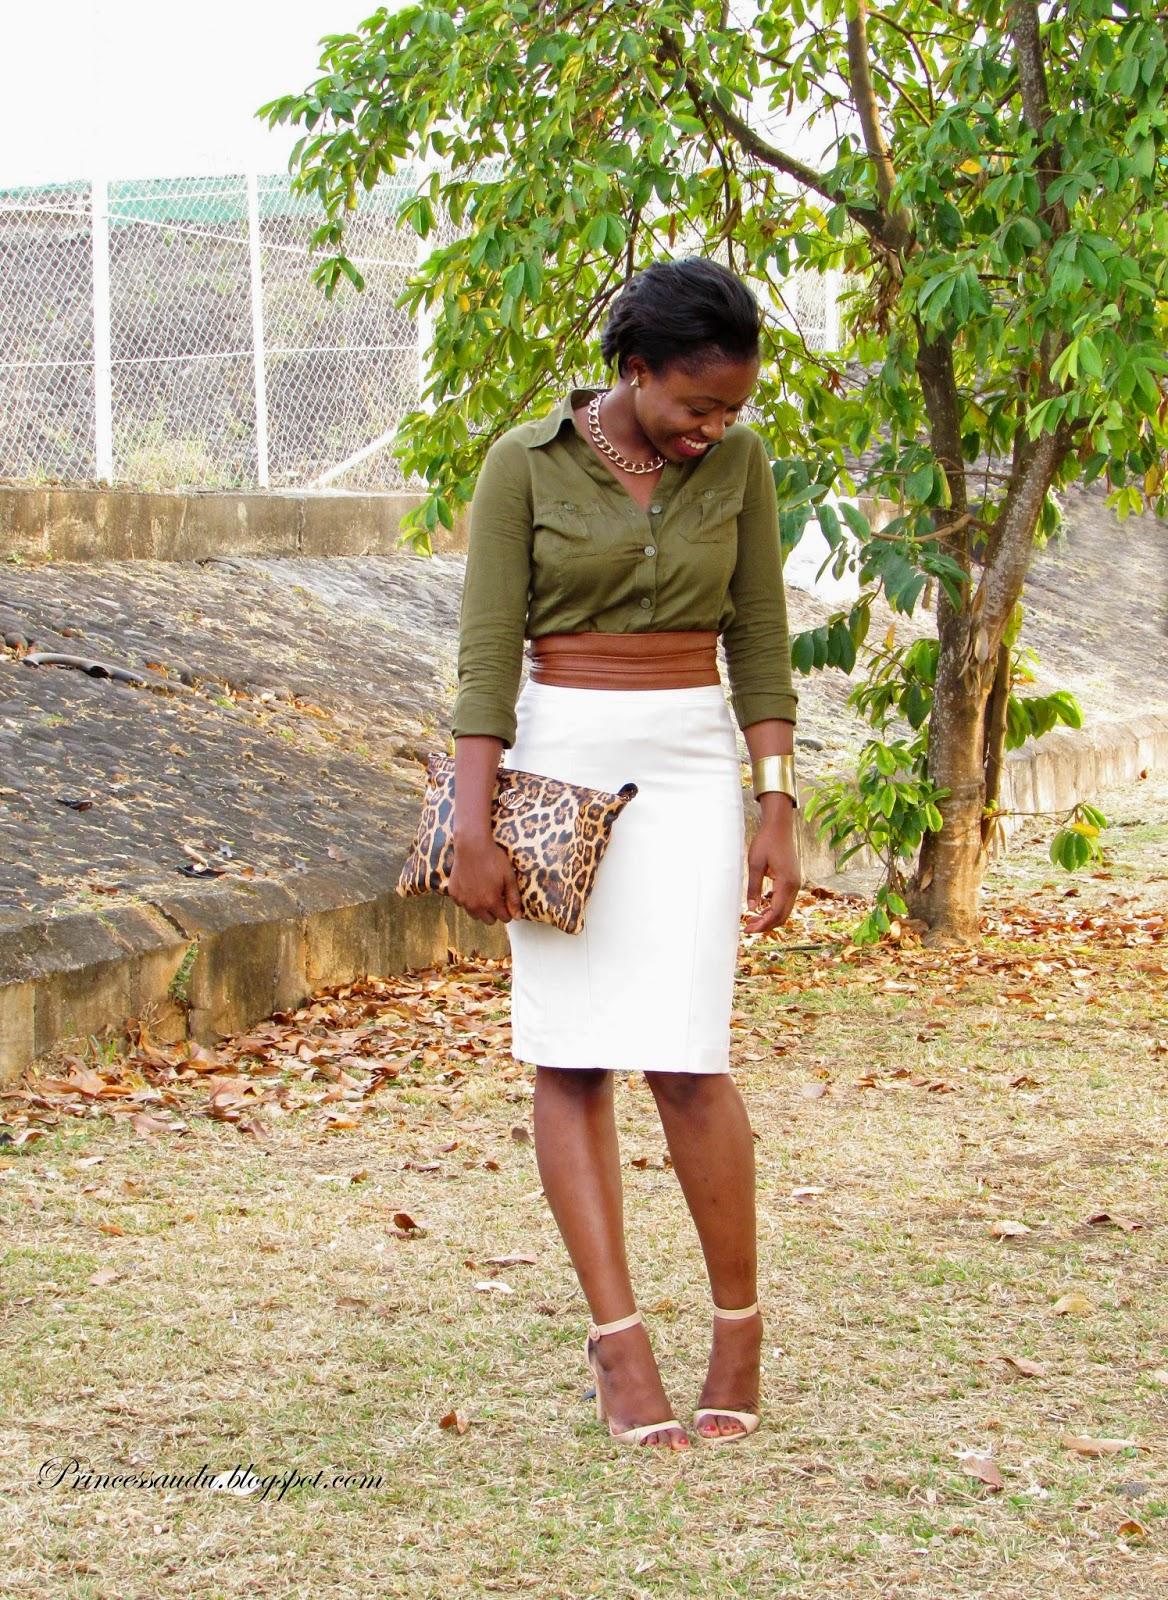 beige pencil skirt, Zara nude ankle strap sandals, khaki, leopard print clutch, army green shirt